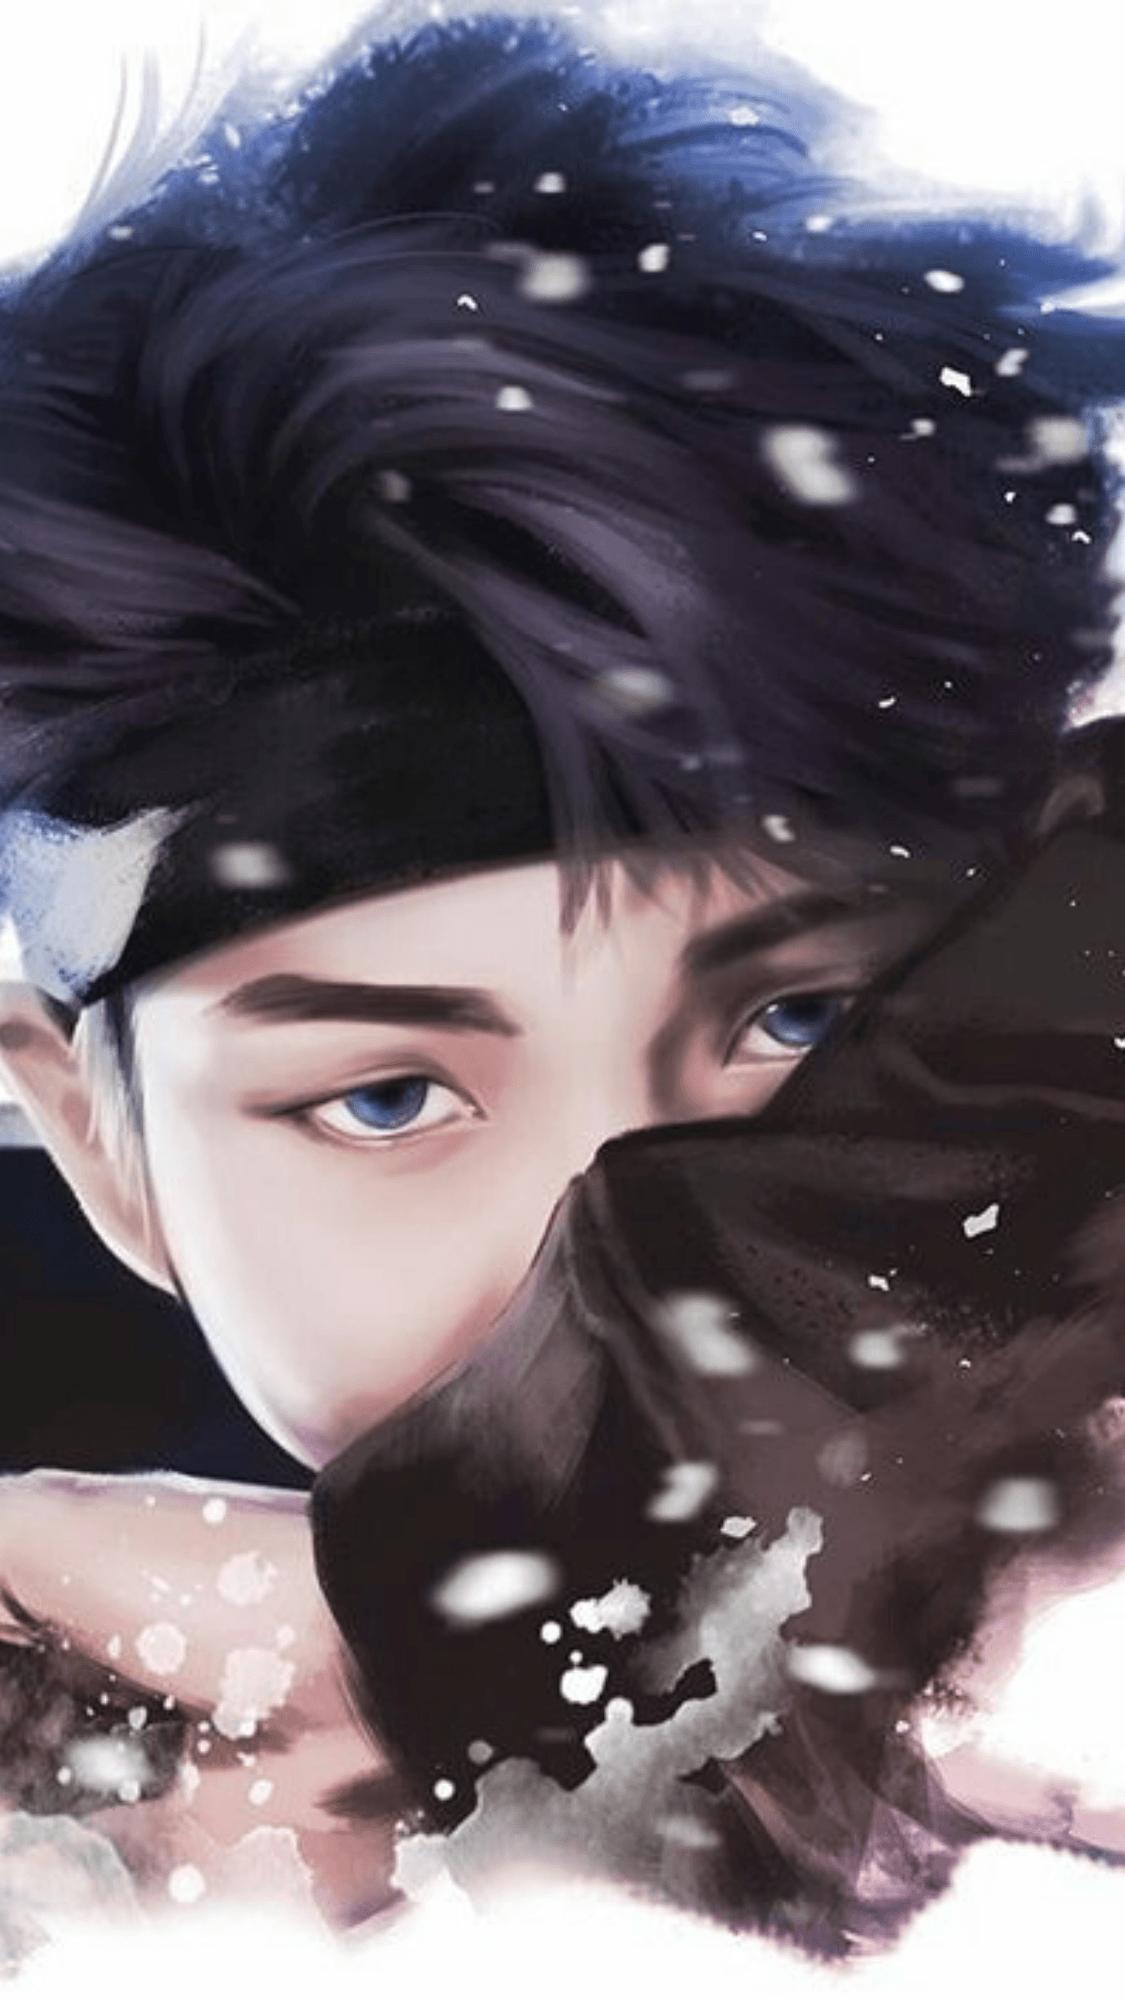 BTS Rap Monster Wallpapers - Wallpaper Cave